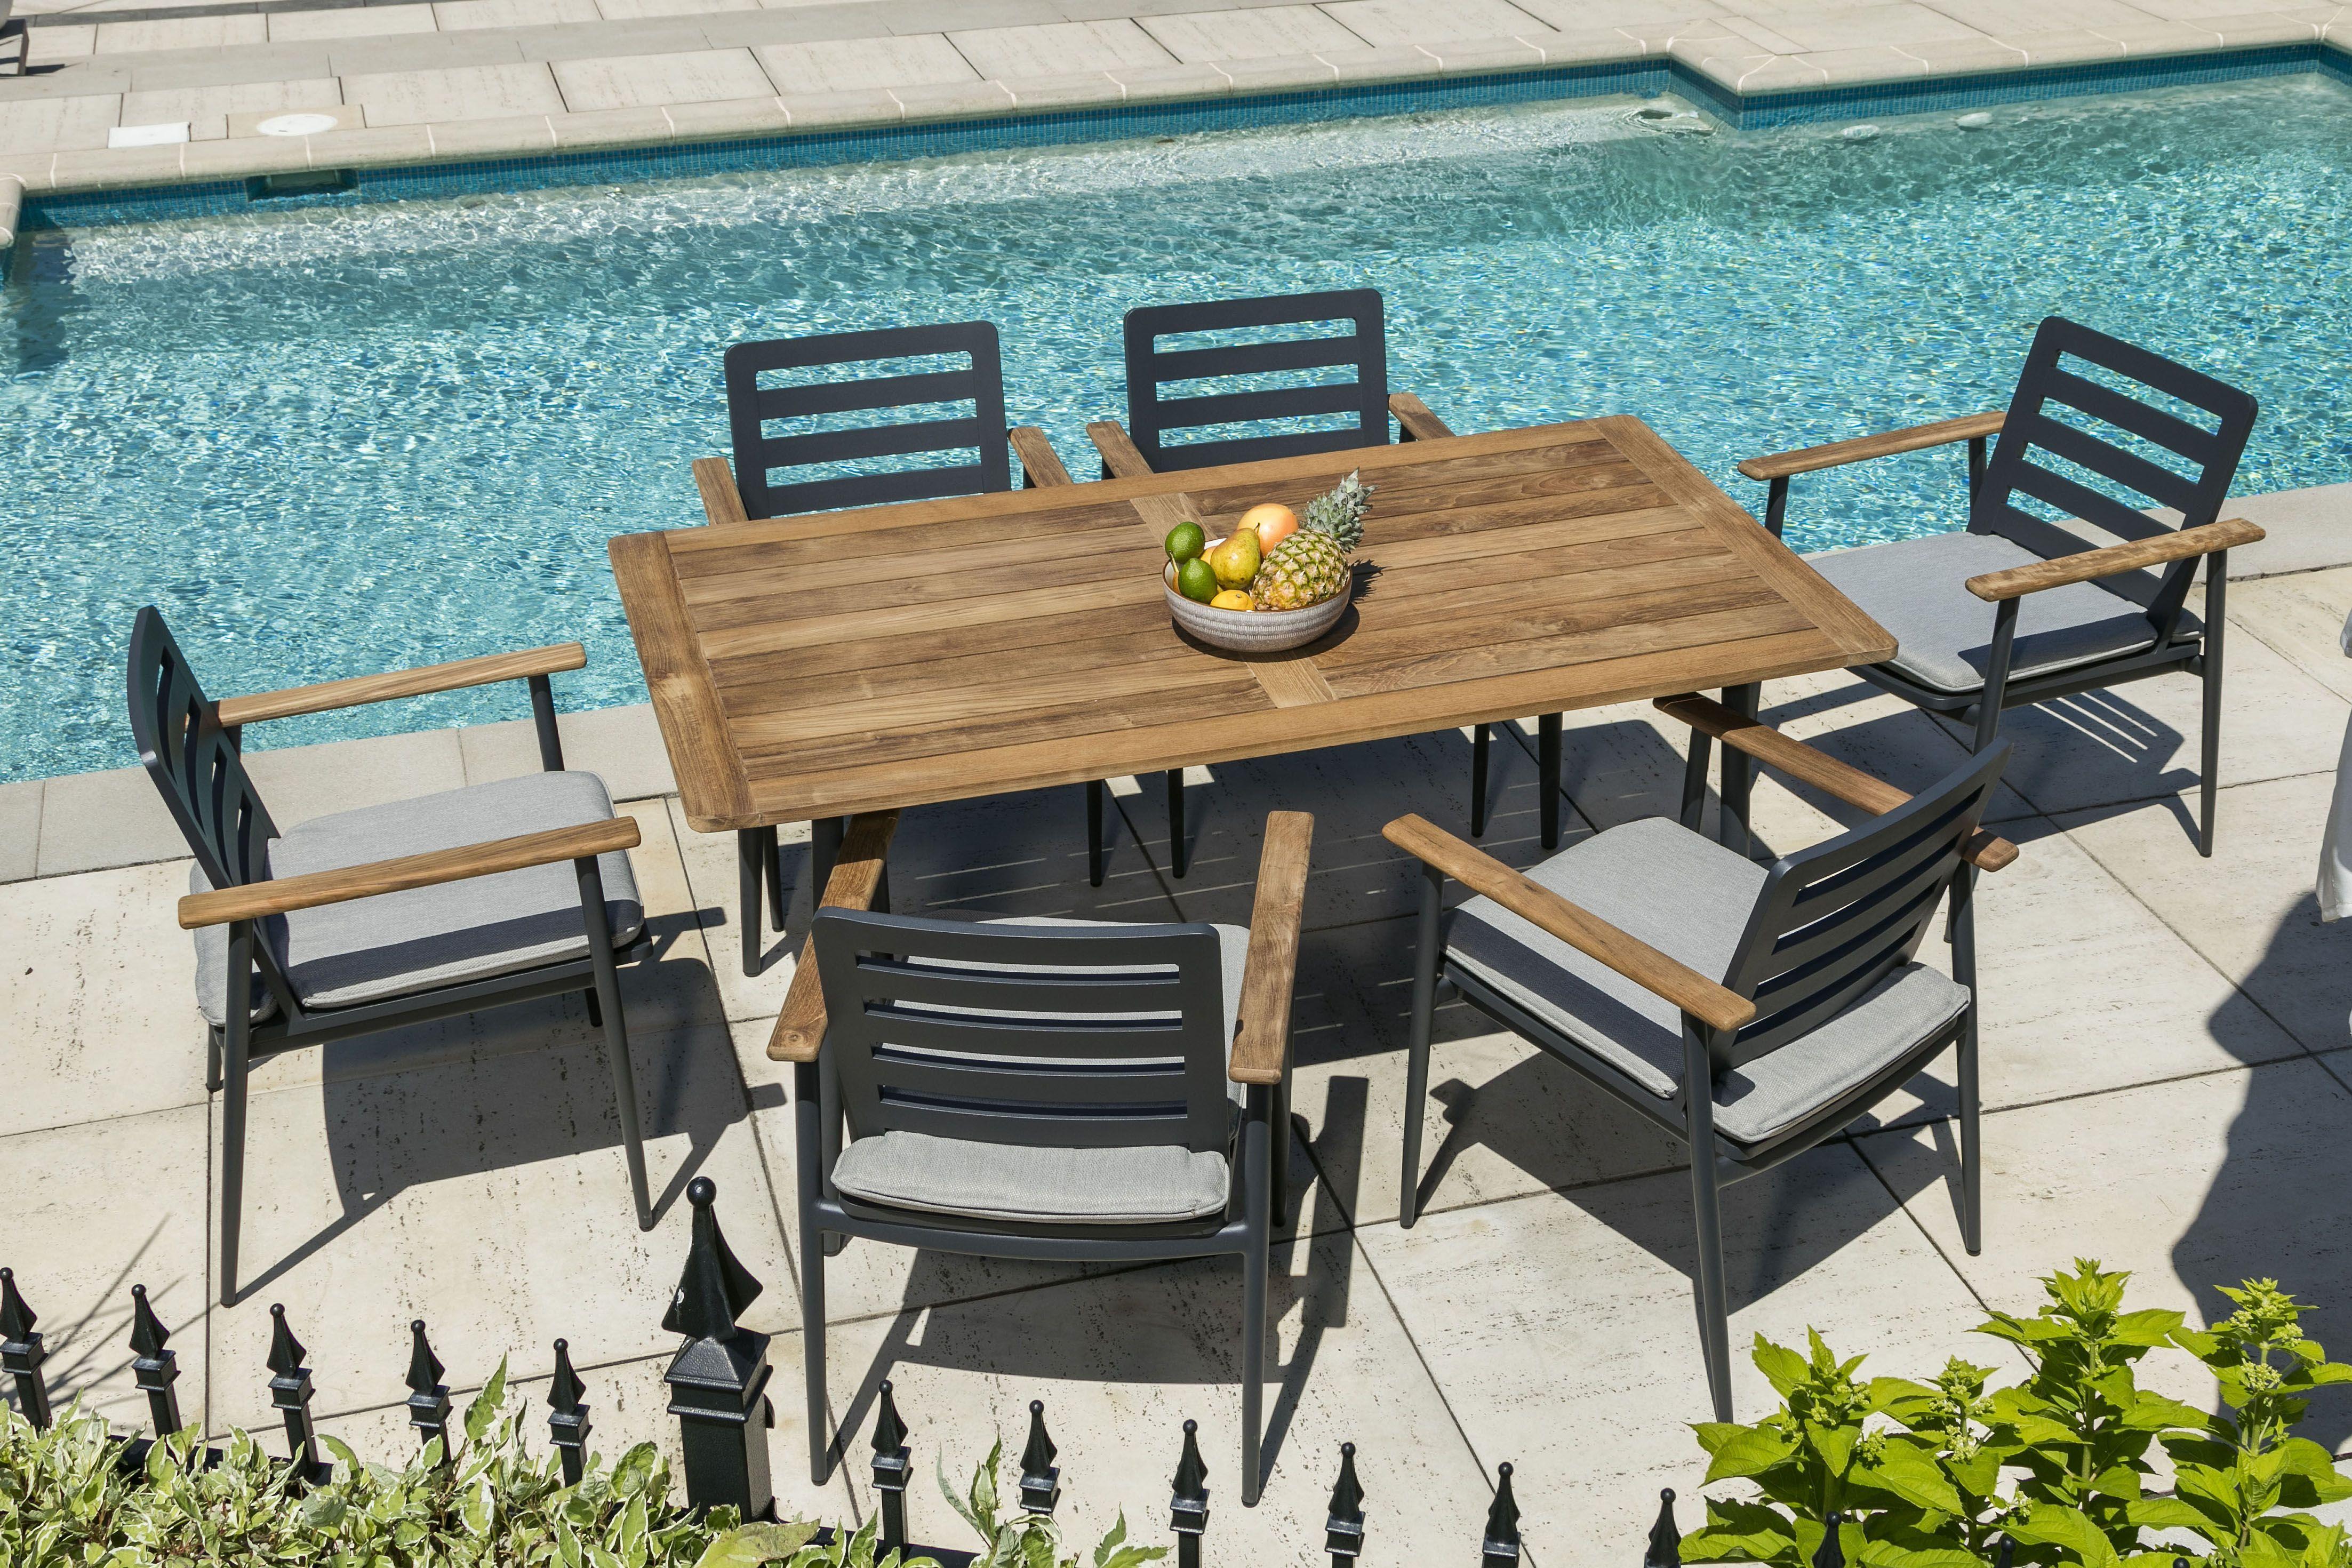 Ensemble A Diner Exterieur Amsterdam Outdoor Dining Set Outdoor Furniture Sets Backyard Design Outdoor Decor